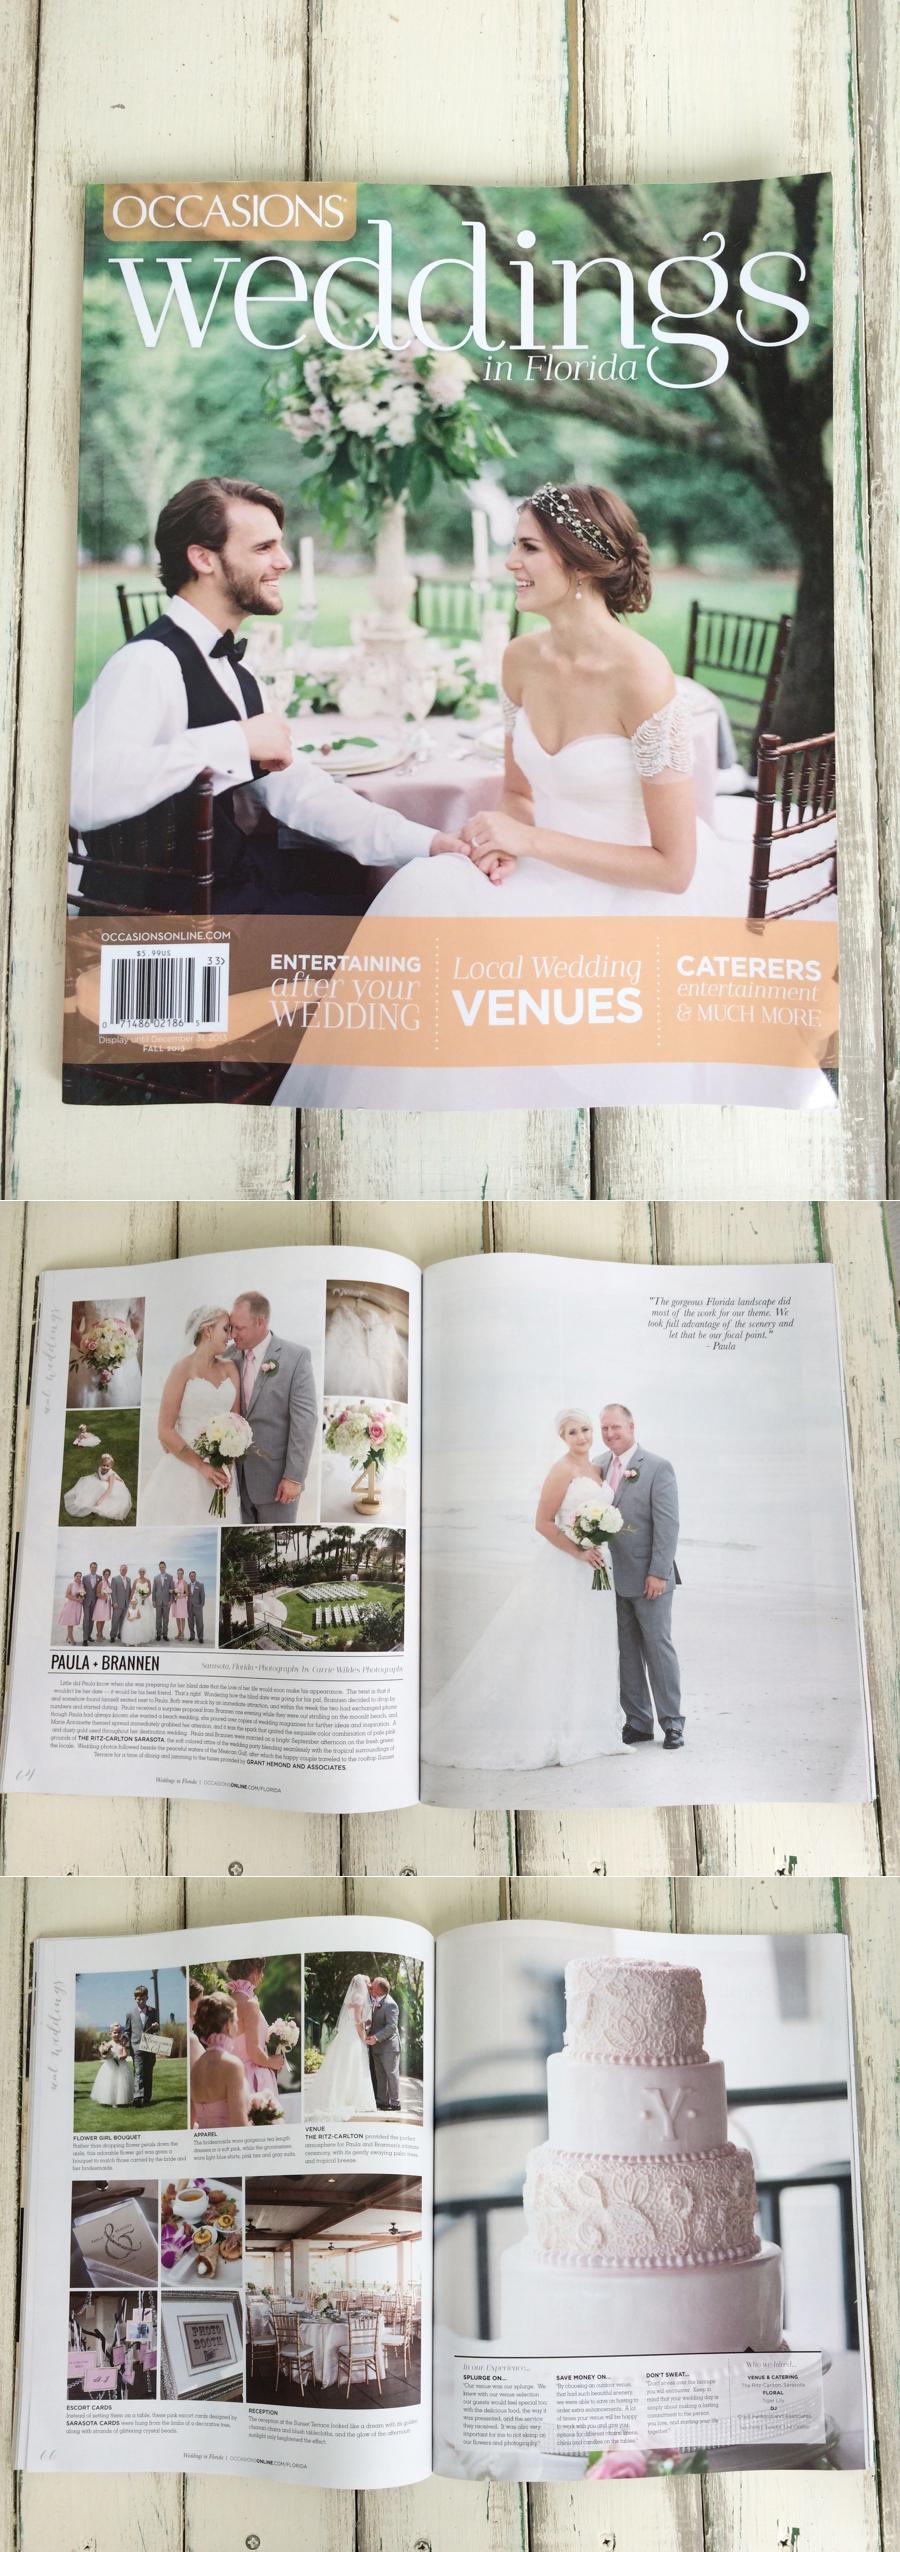 10_15_13 Occasions Magazine Wedding Feature_0001.jpg